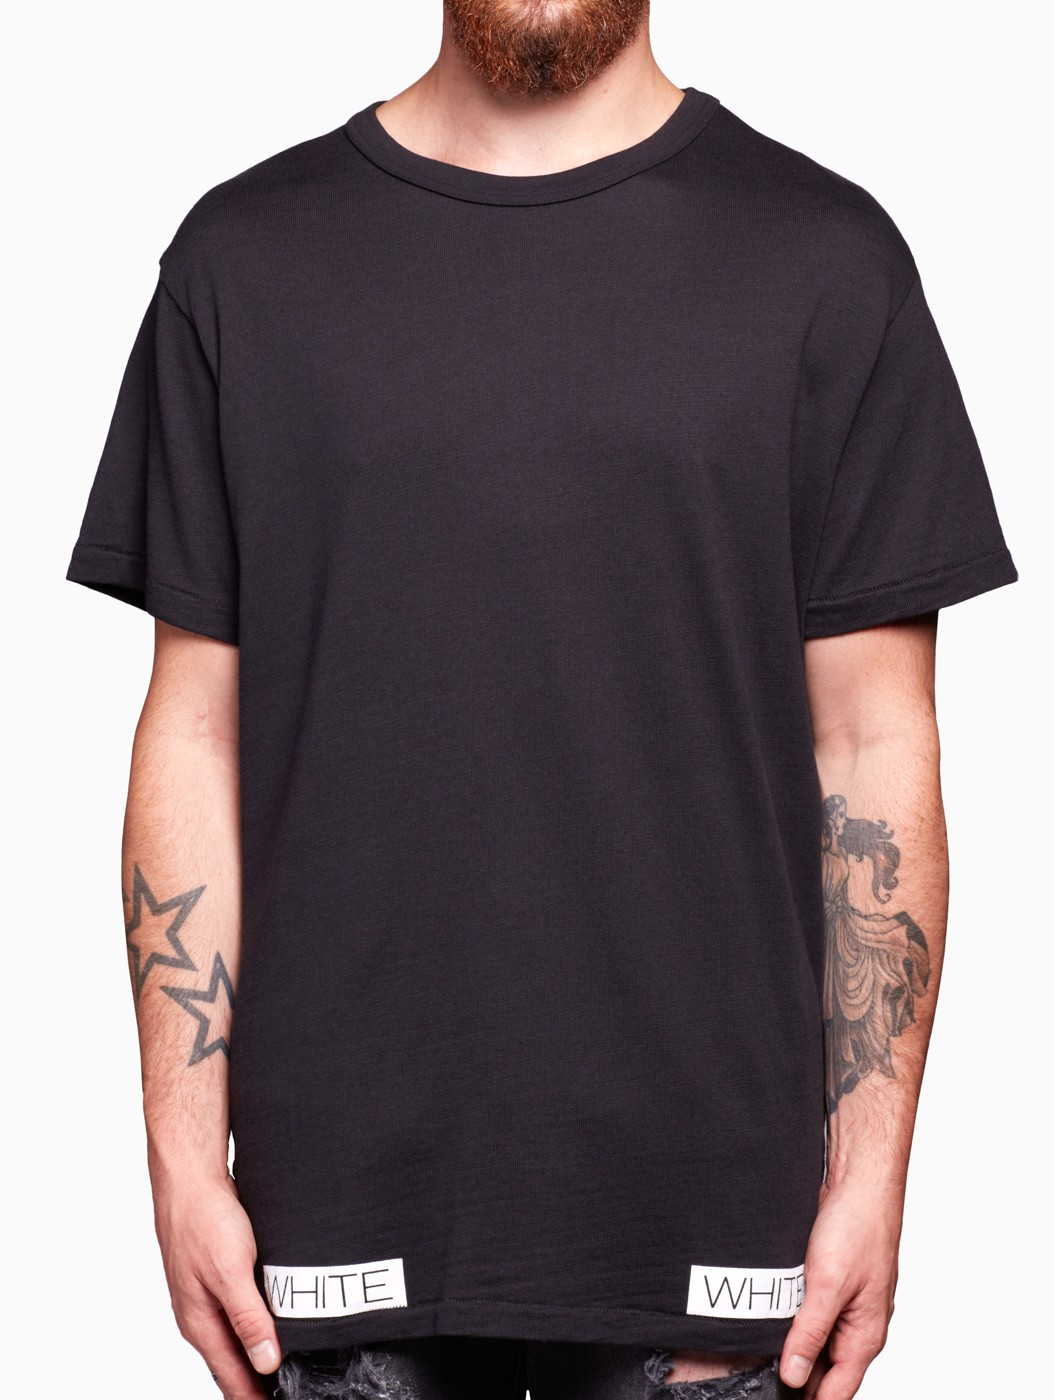 Black t shirt white collar - Gallery